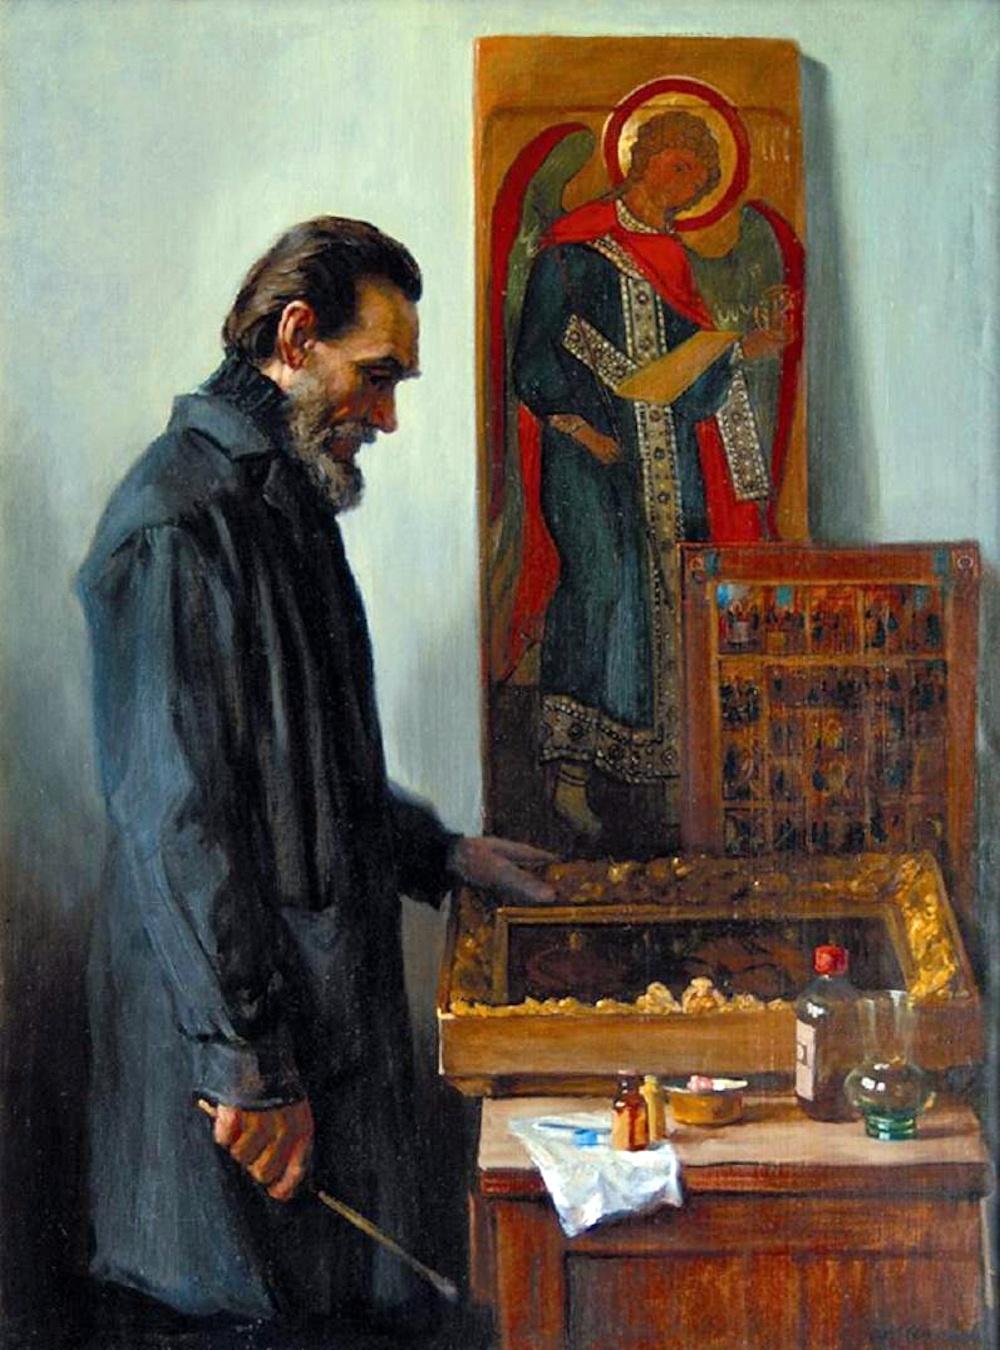 00 Mikhail Shankov. The Restorer. 1984